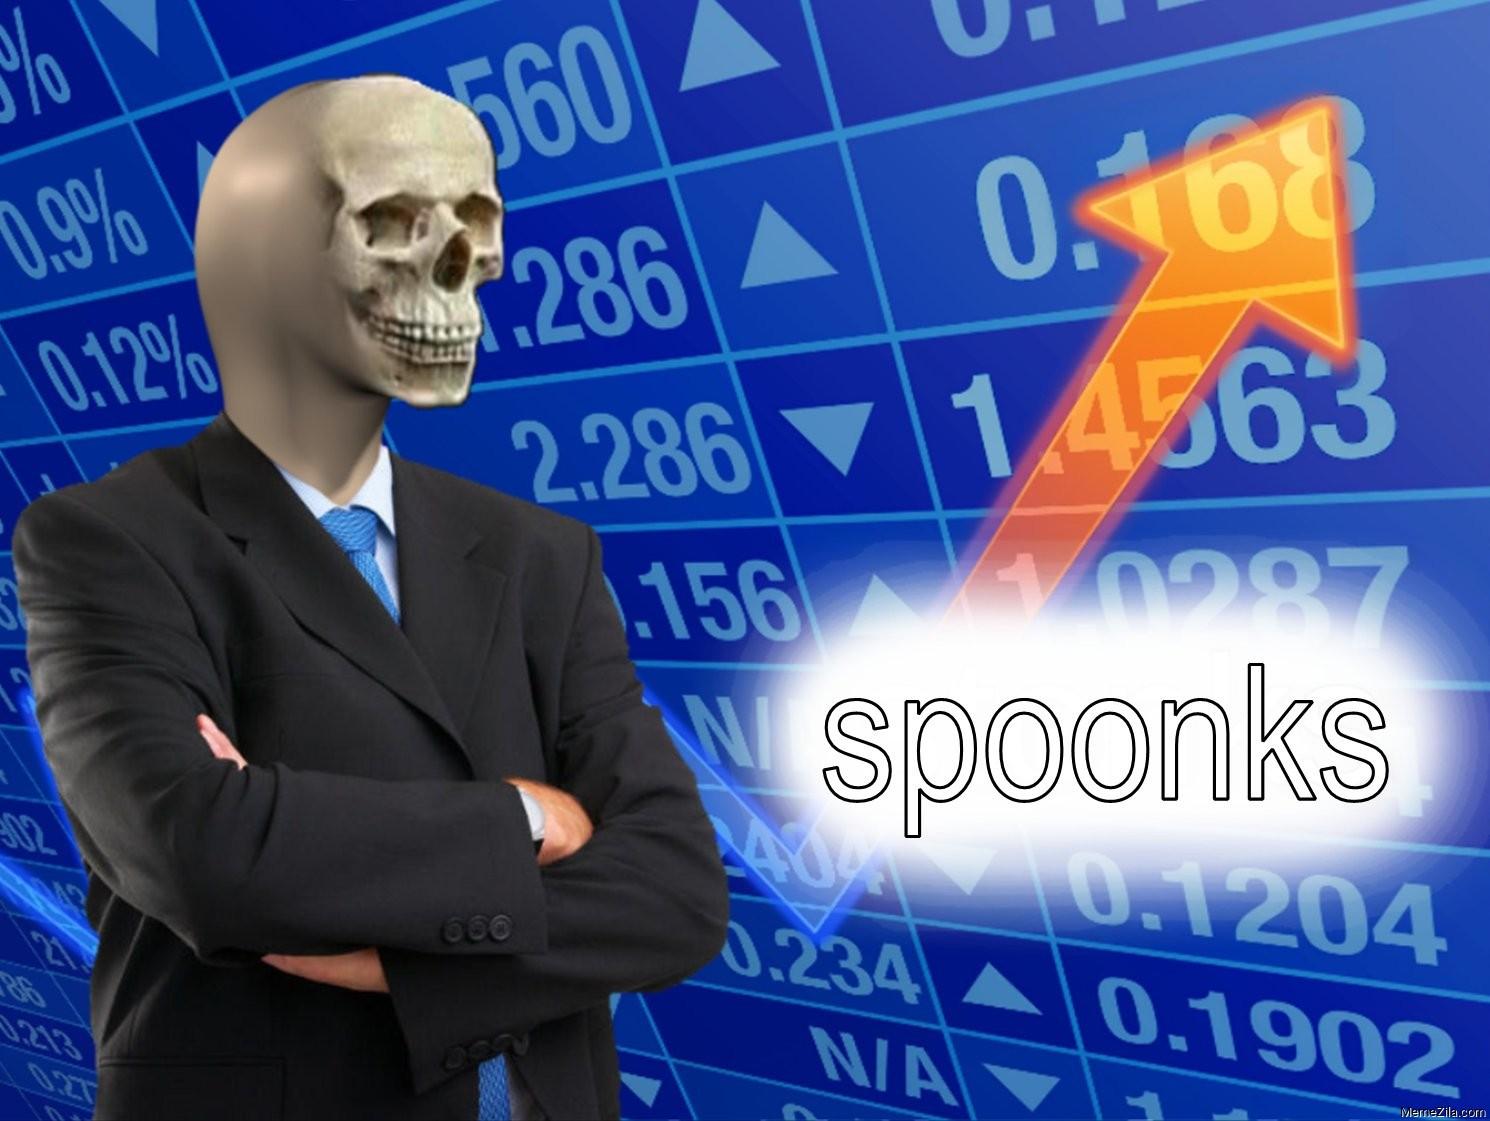 Spoonks meme